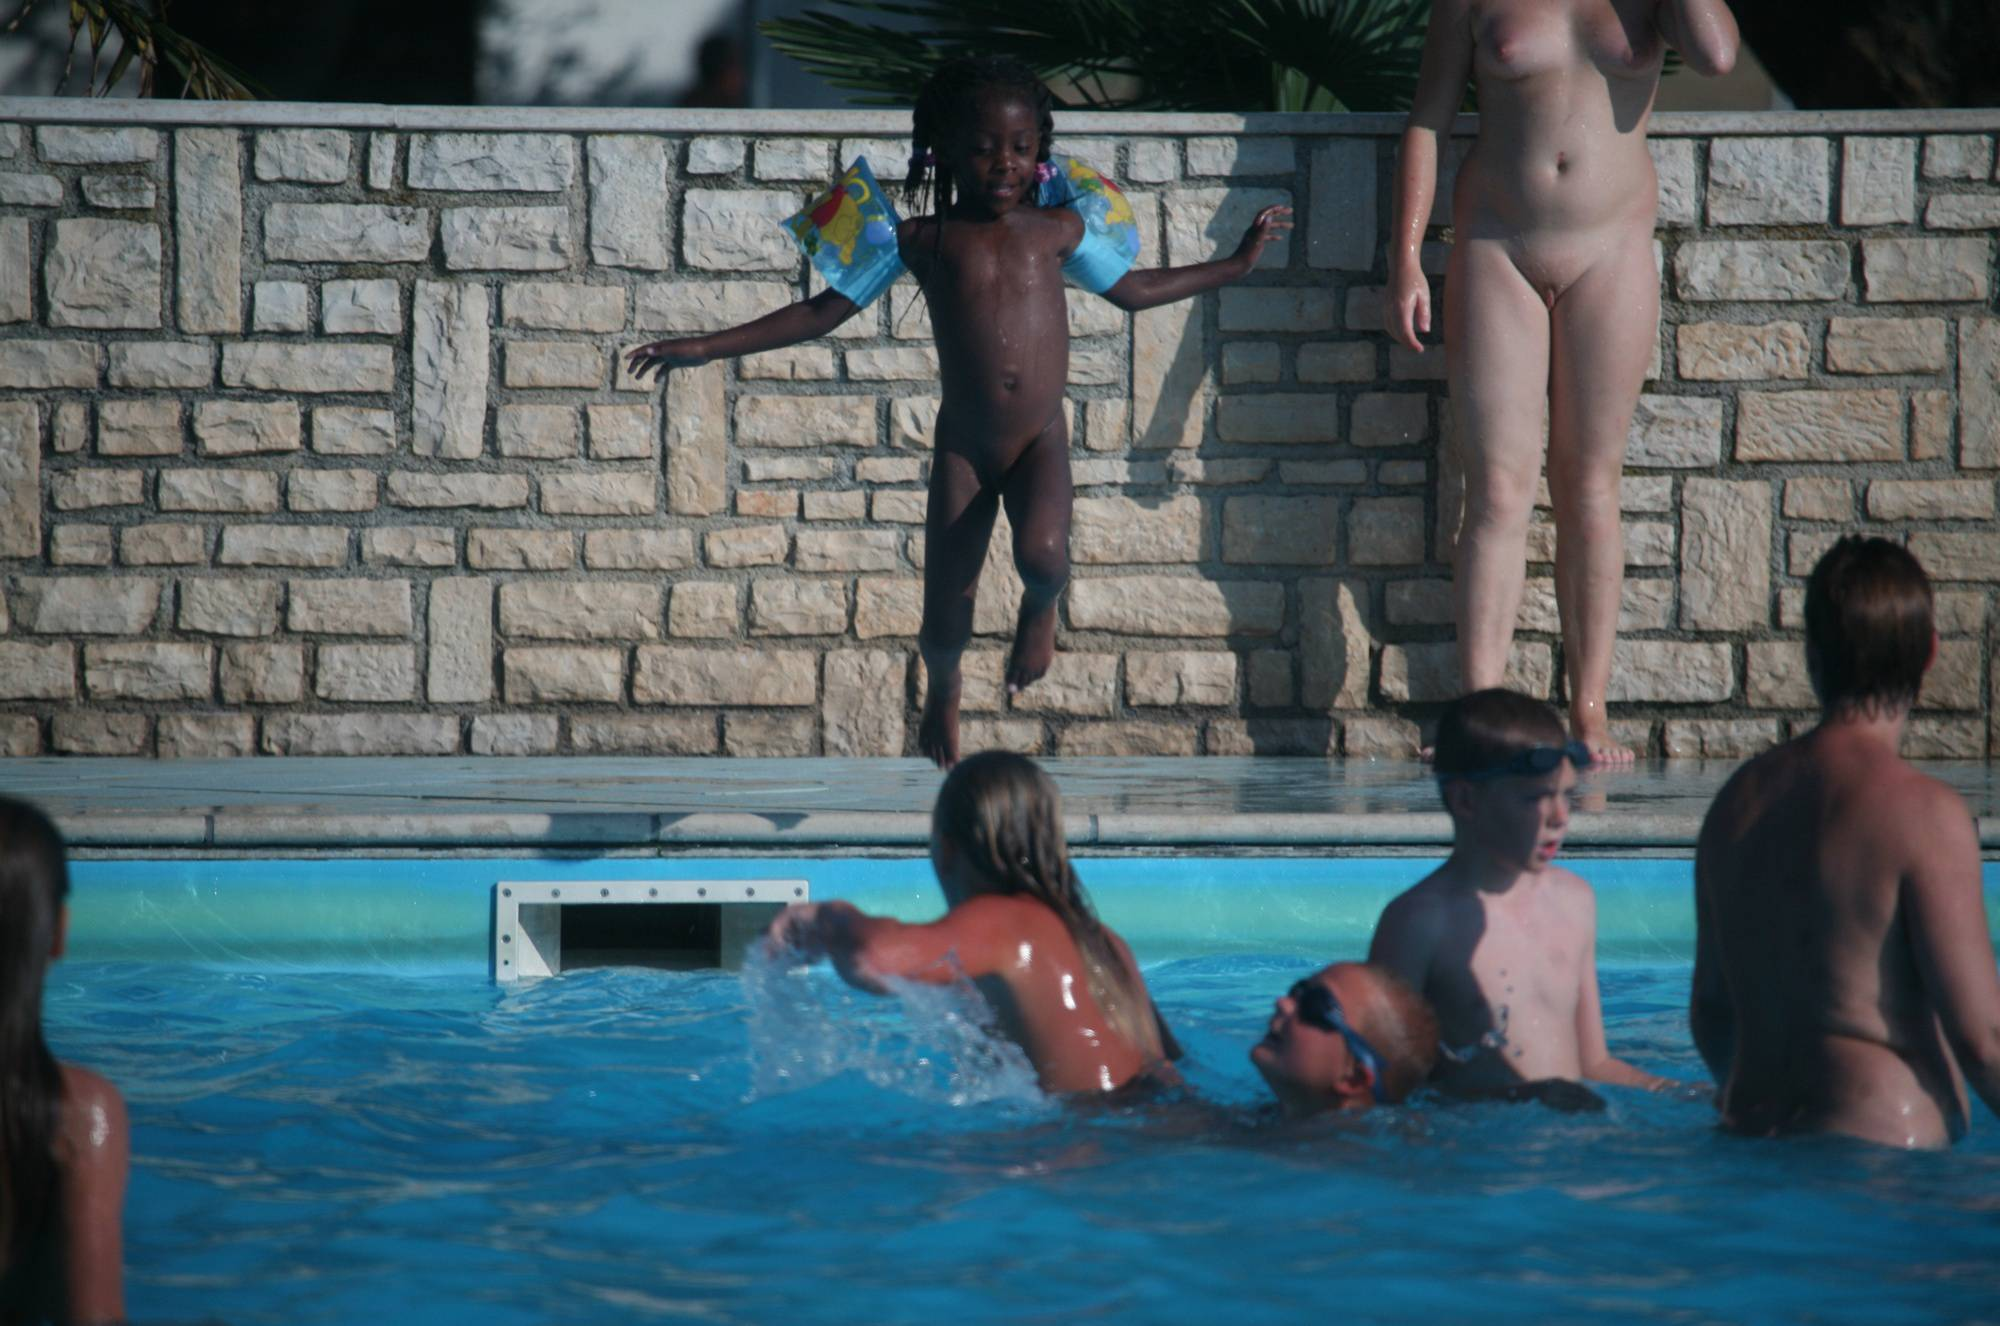 Nudist Pool Jumpers Two - 1